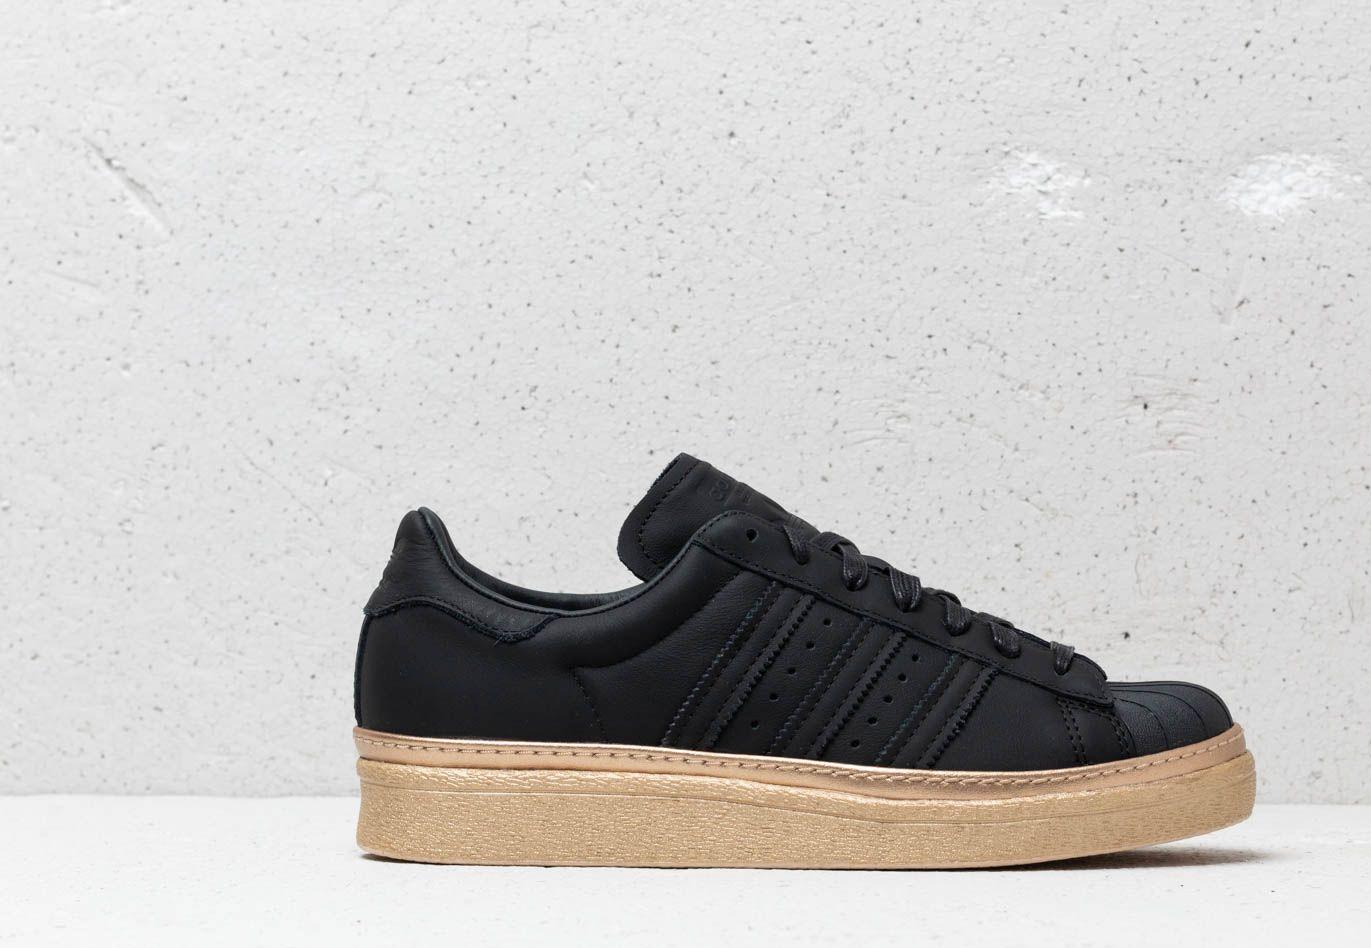 half off bafca 14964 Lyst - adidas Originals Adidas Superstar 80s New Bold W Core Black ...  adidas